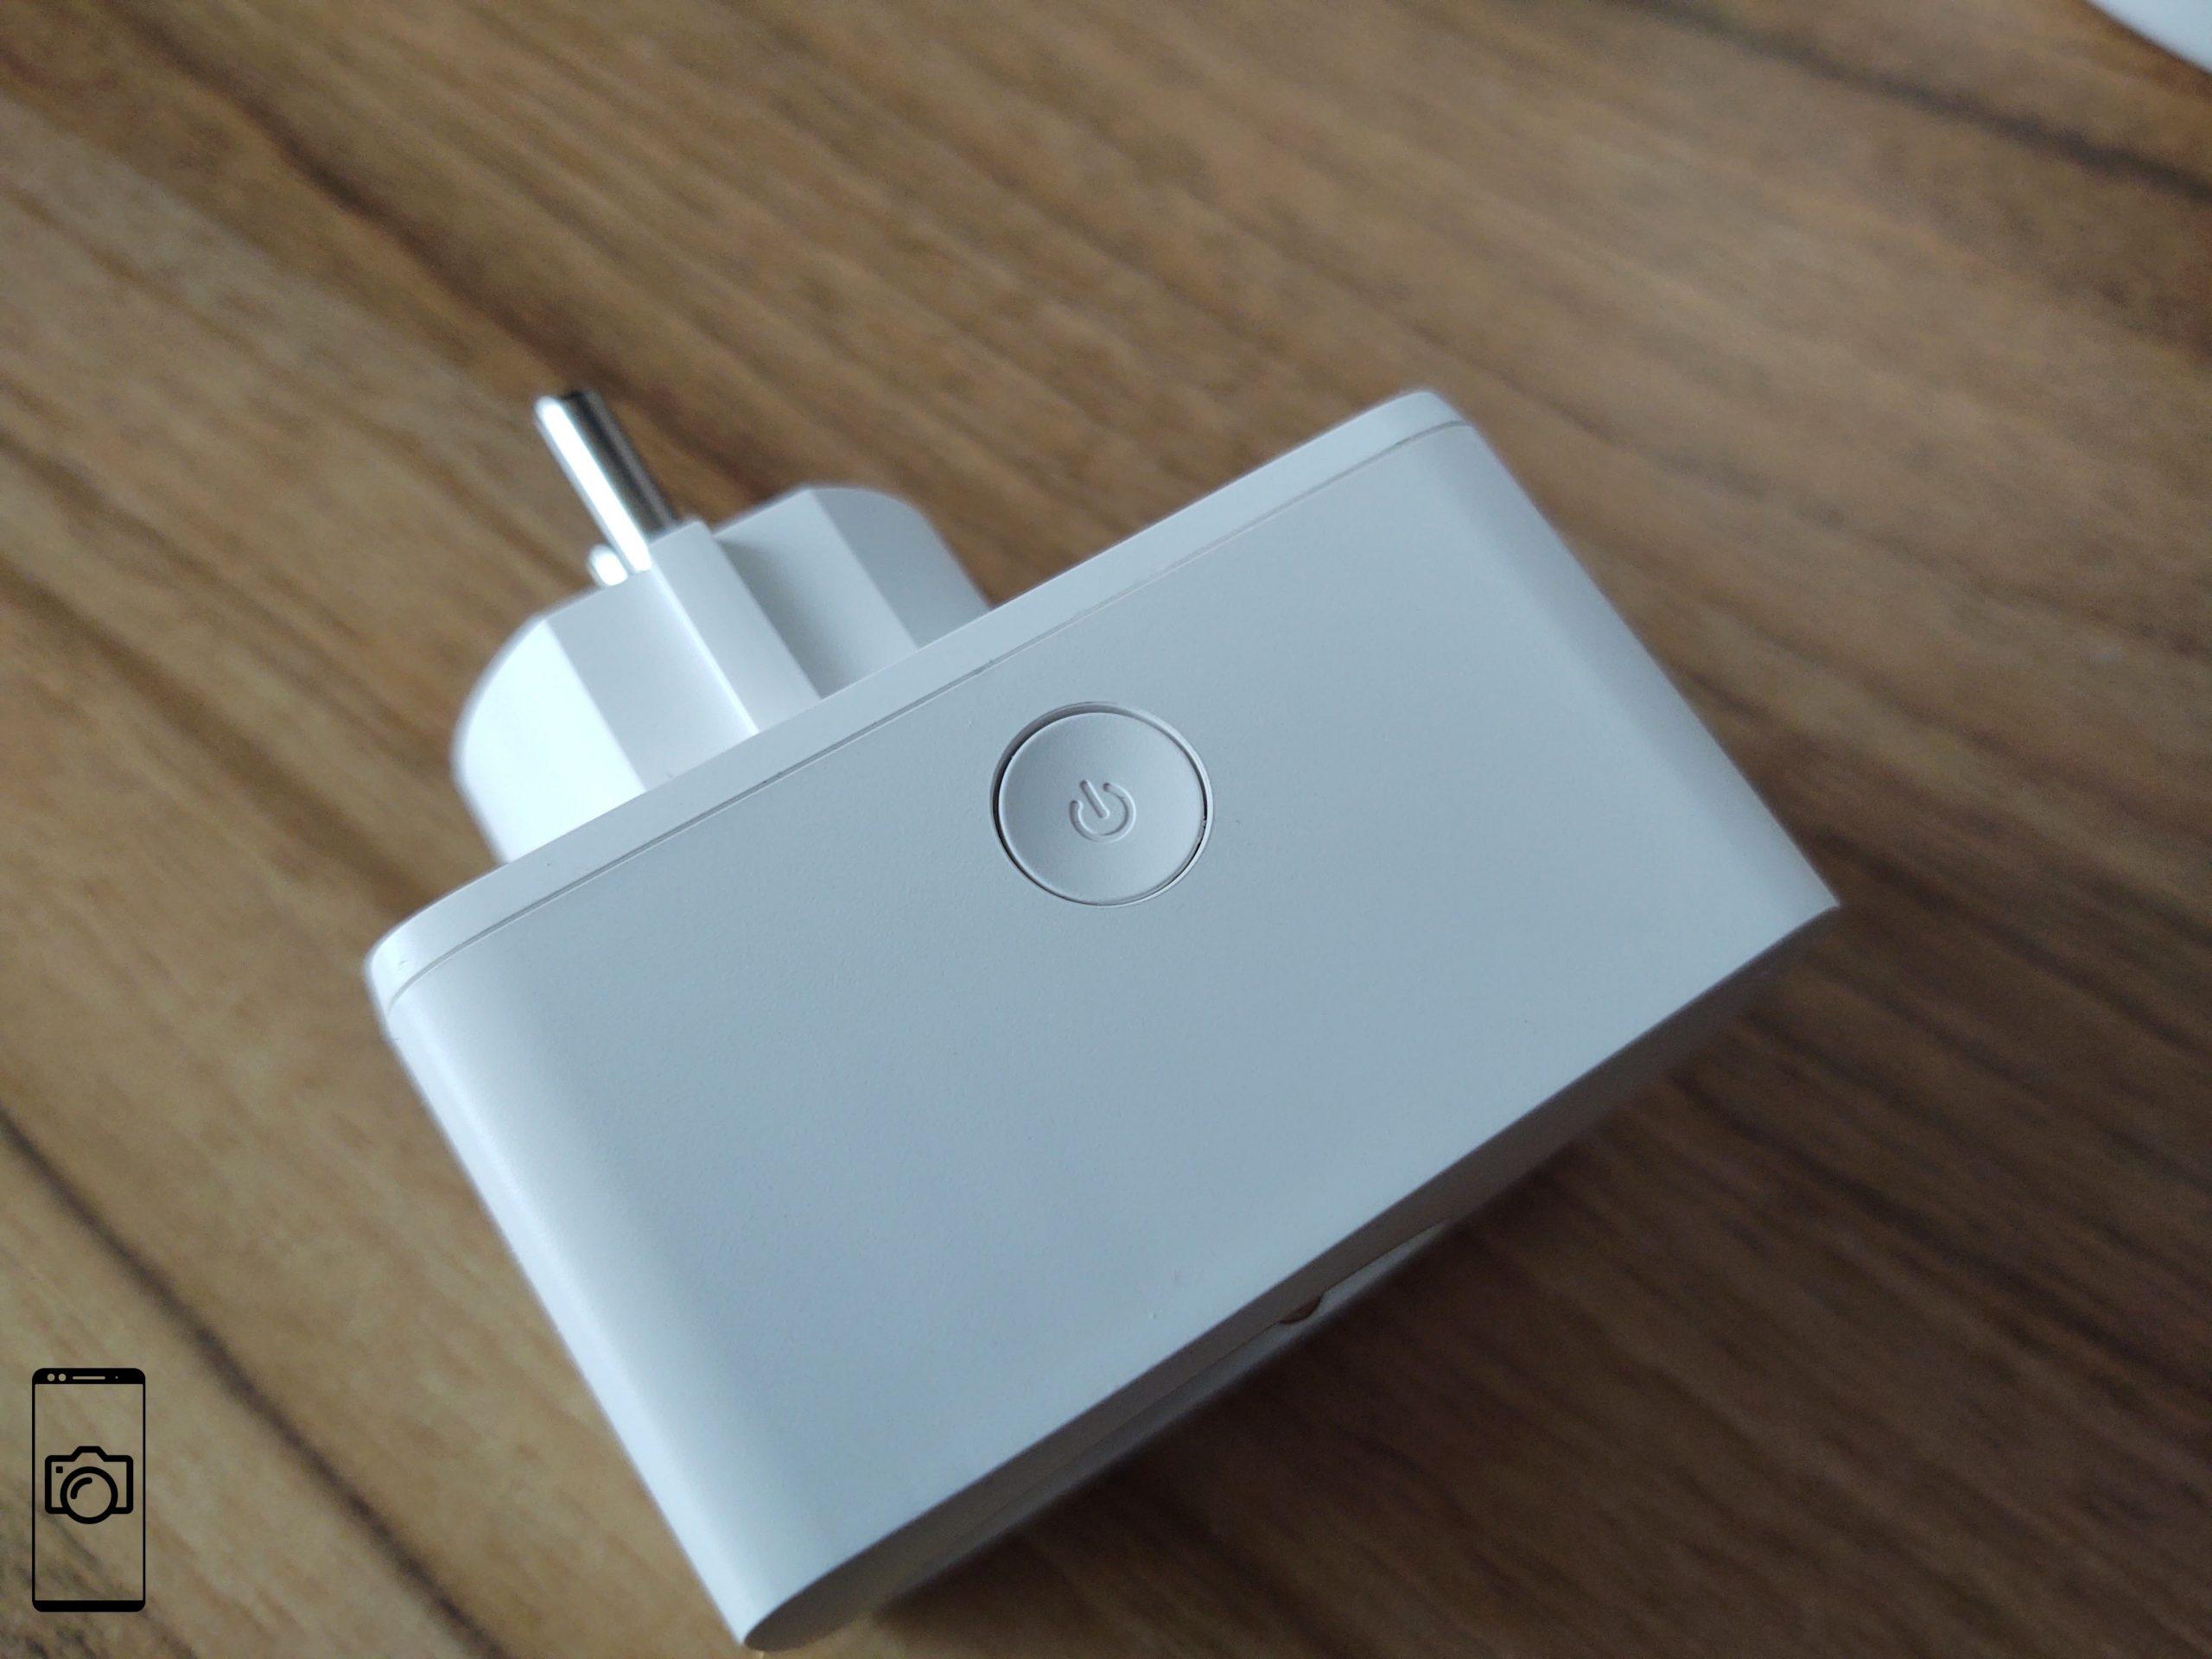 TP-Link Smart Kasa Tapo P100